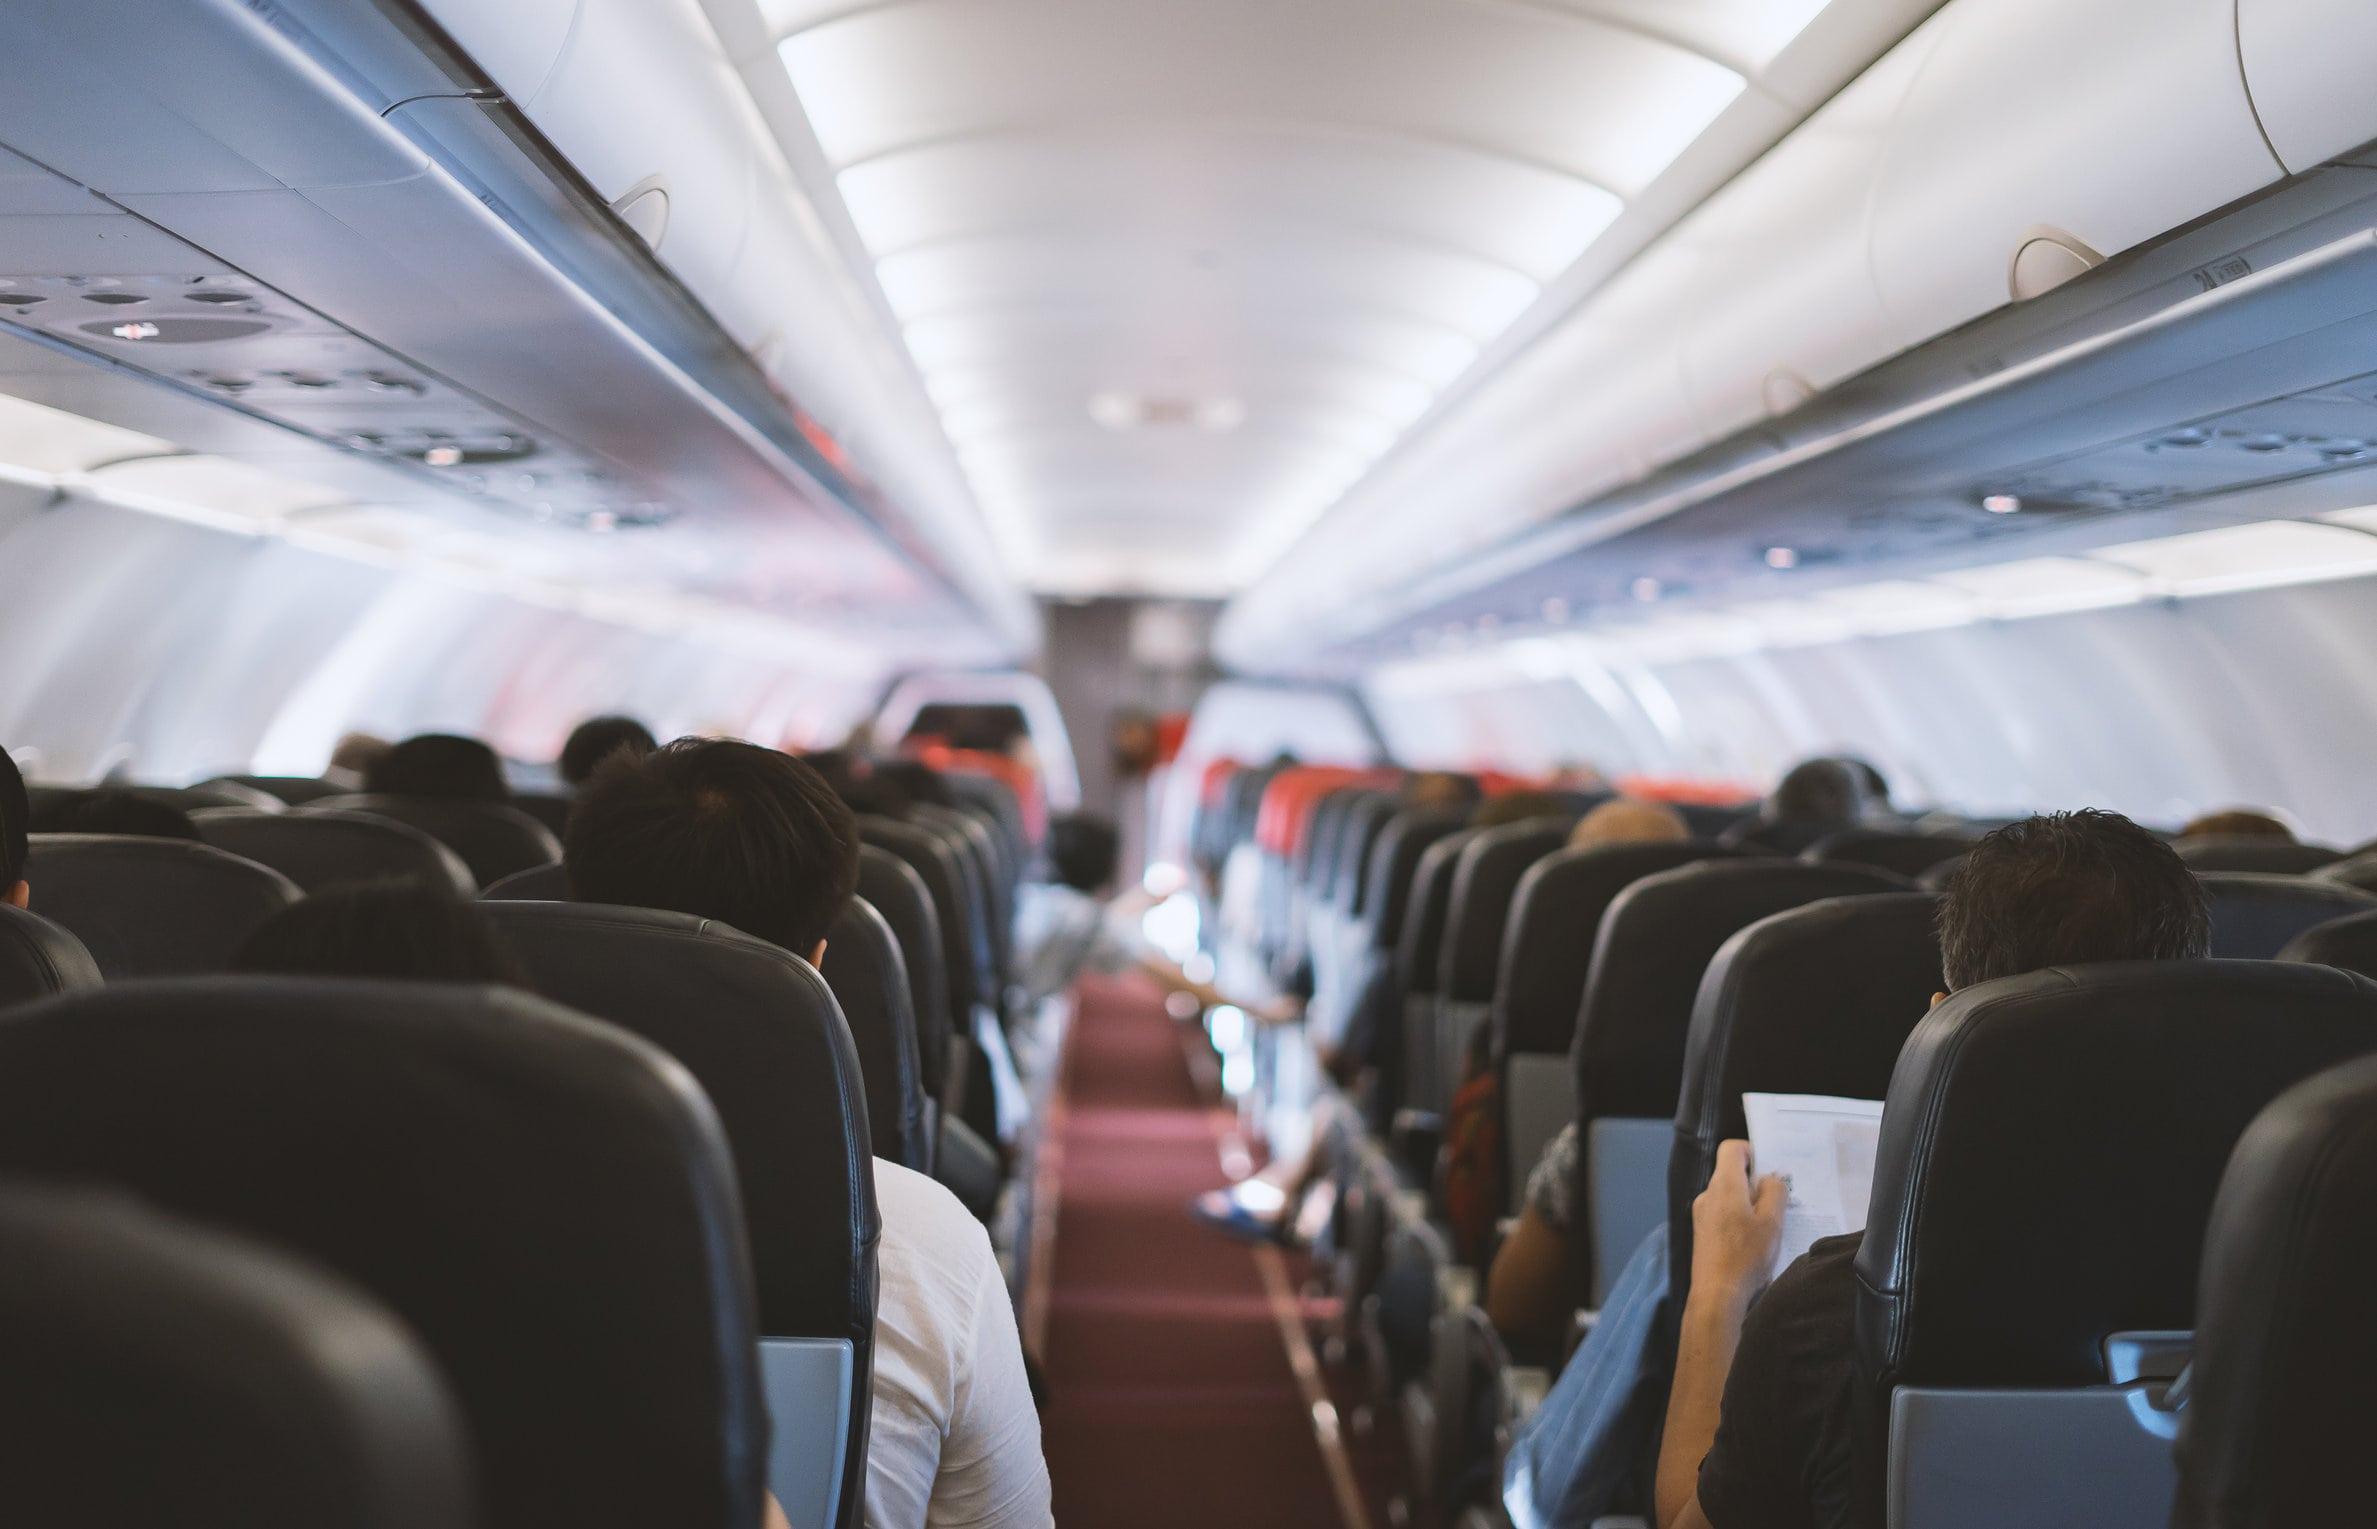 in-flight Wi-Fi, zangi messenger